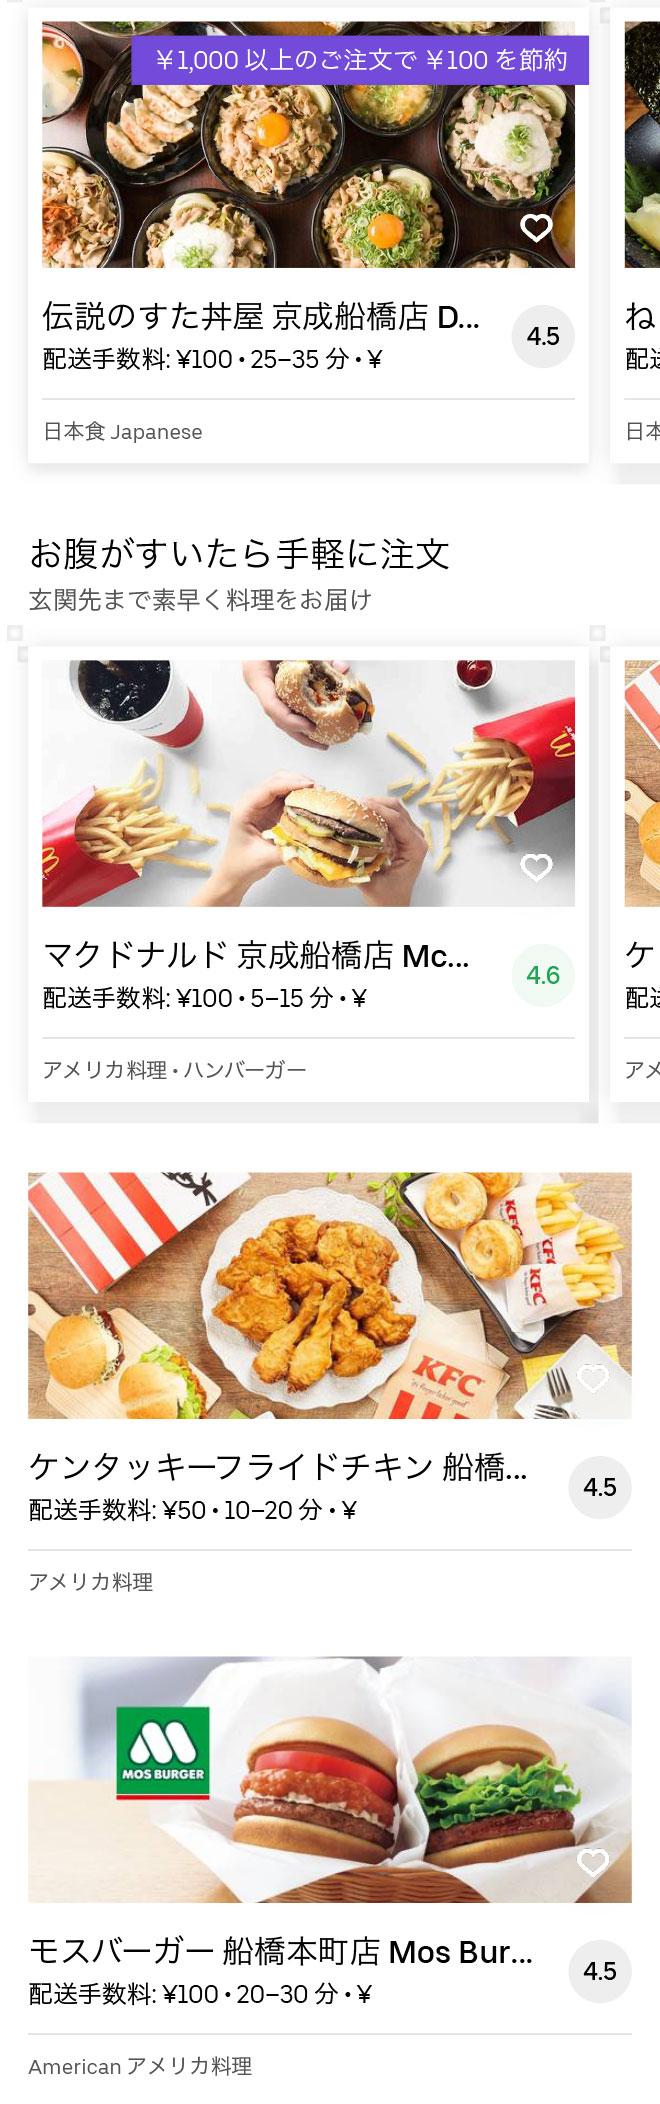 Funabashi menu 2004 01